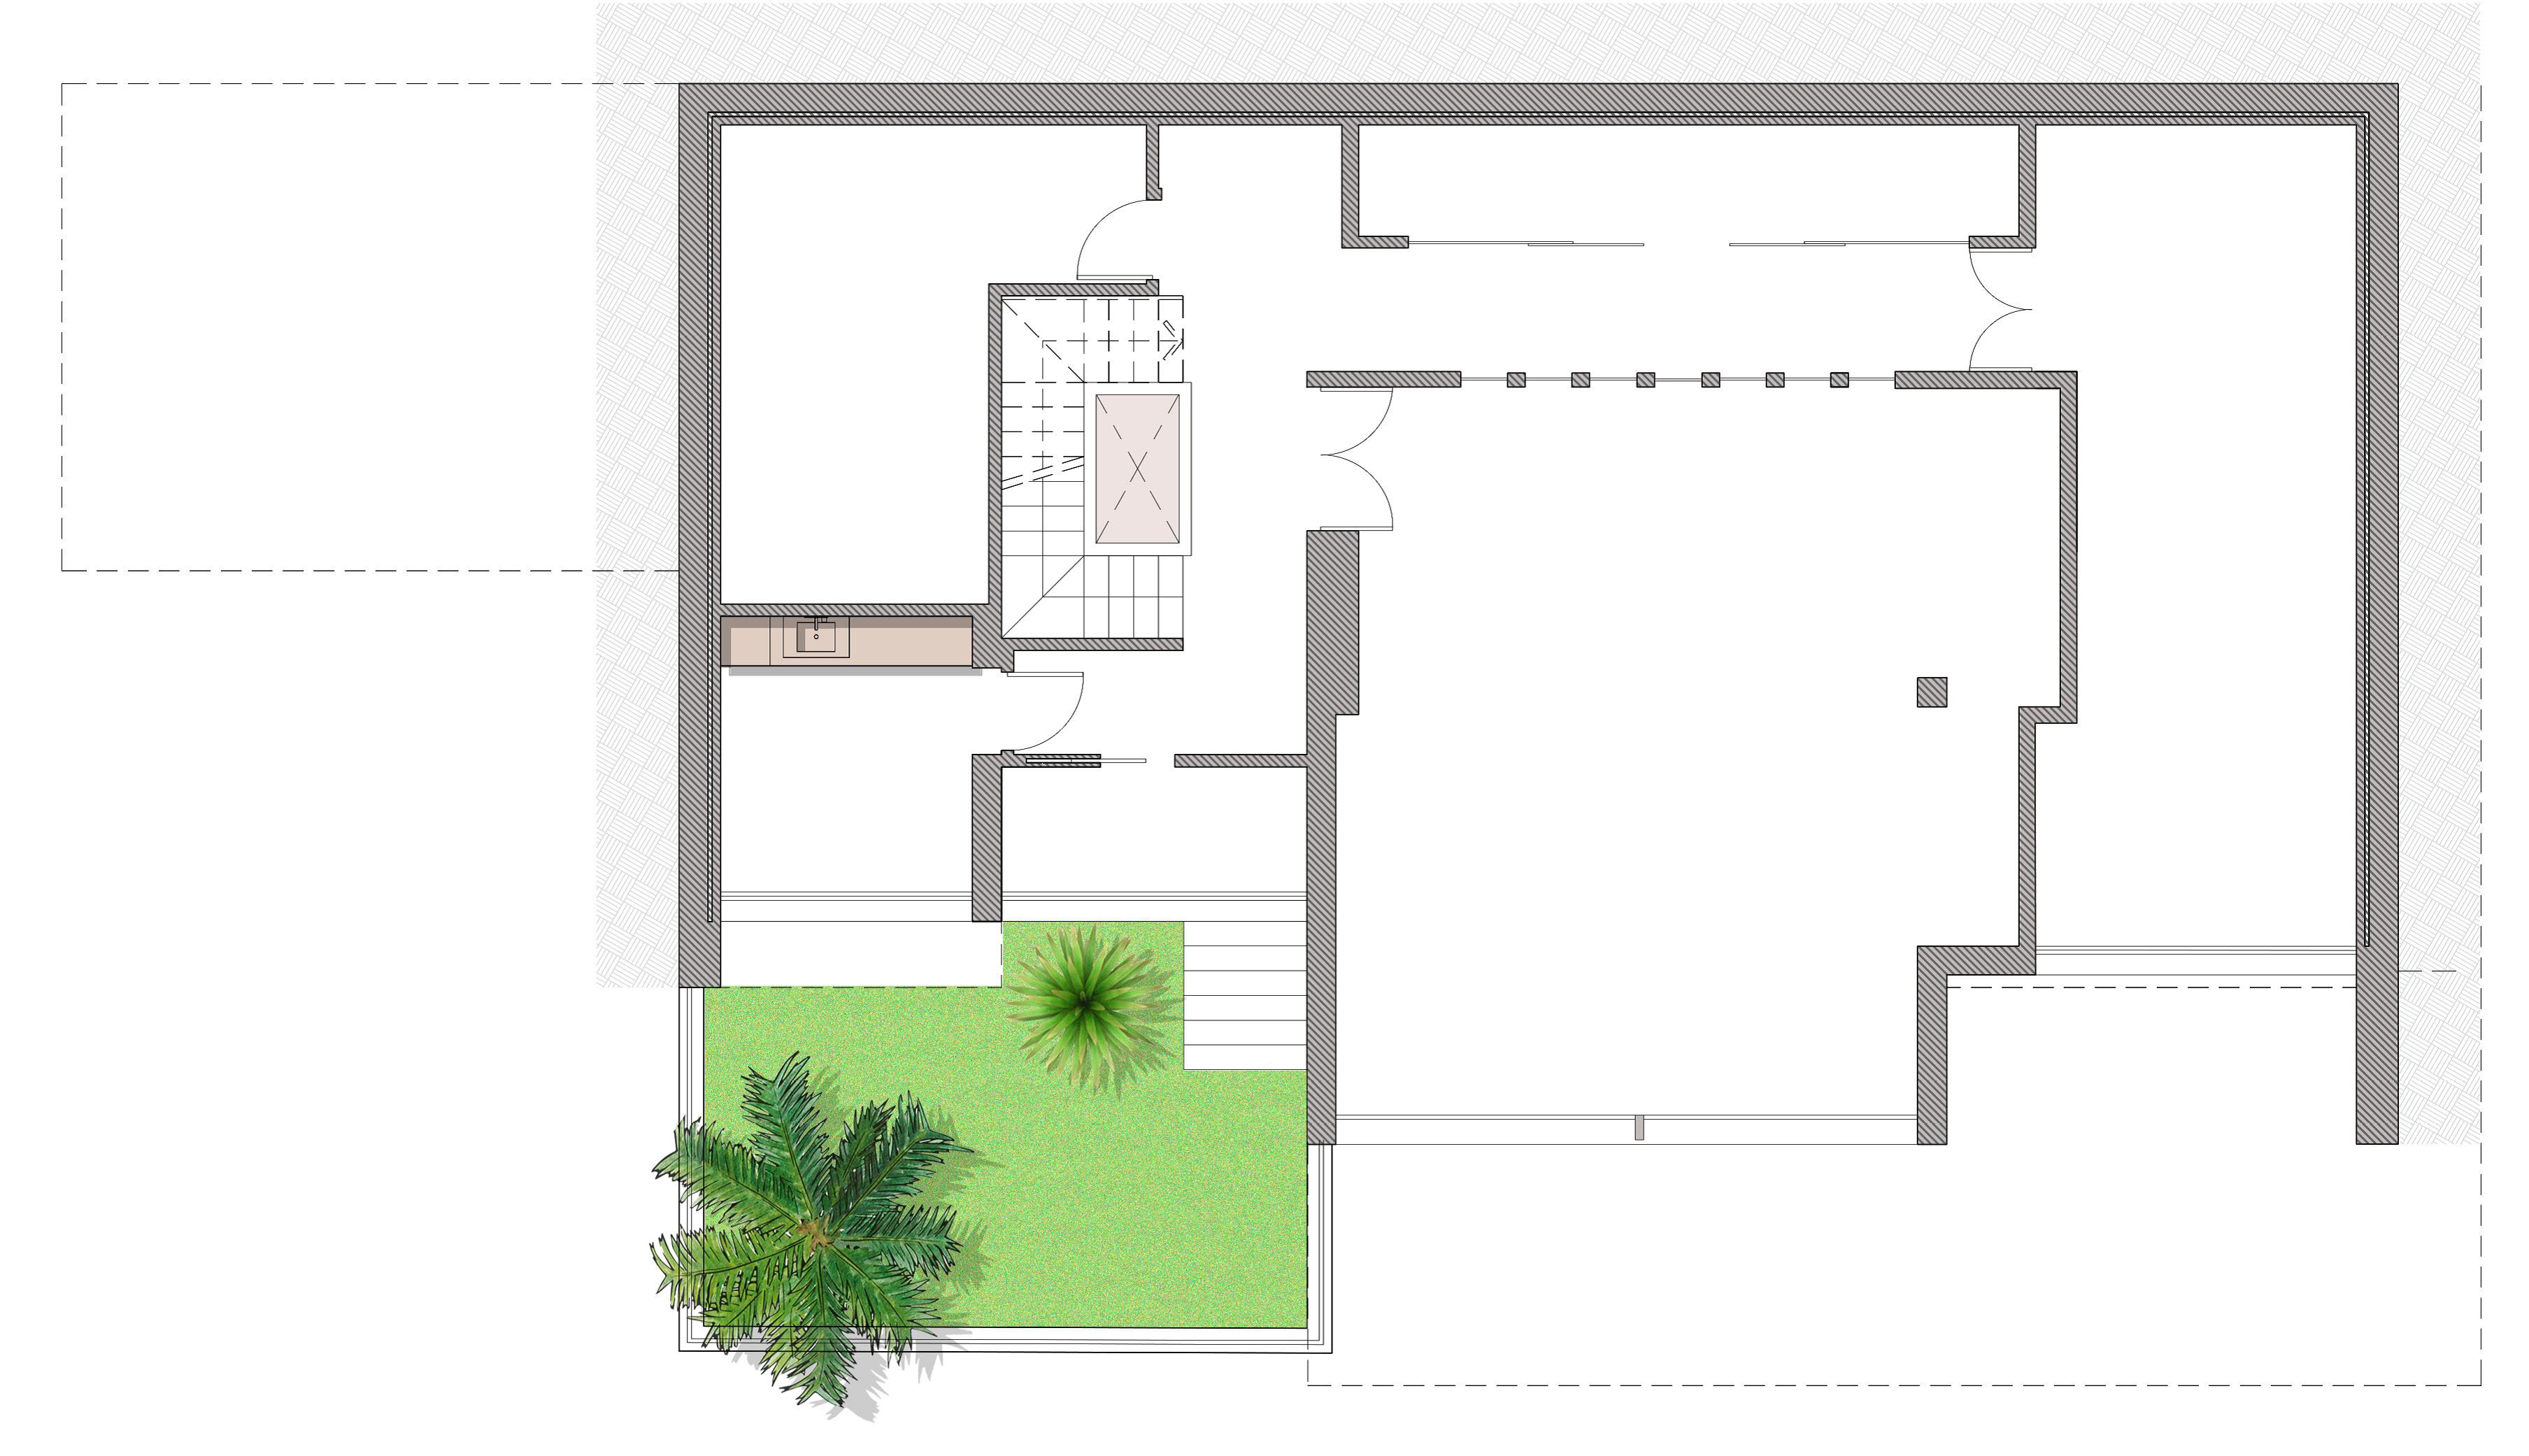 Qlistings - Villa Surya Property Image